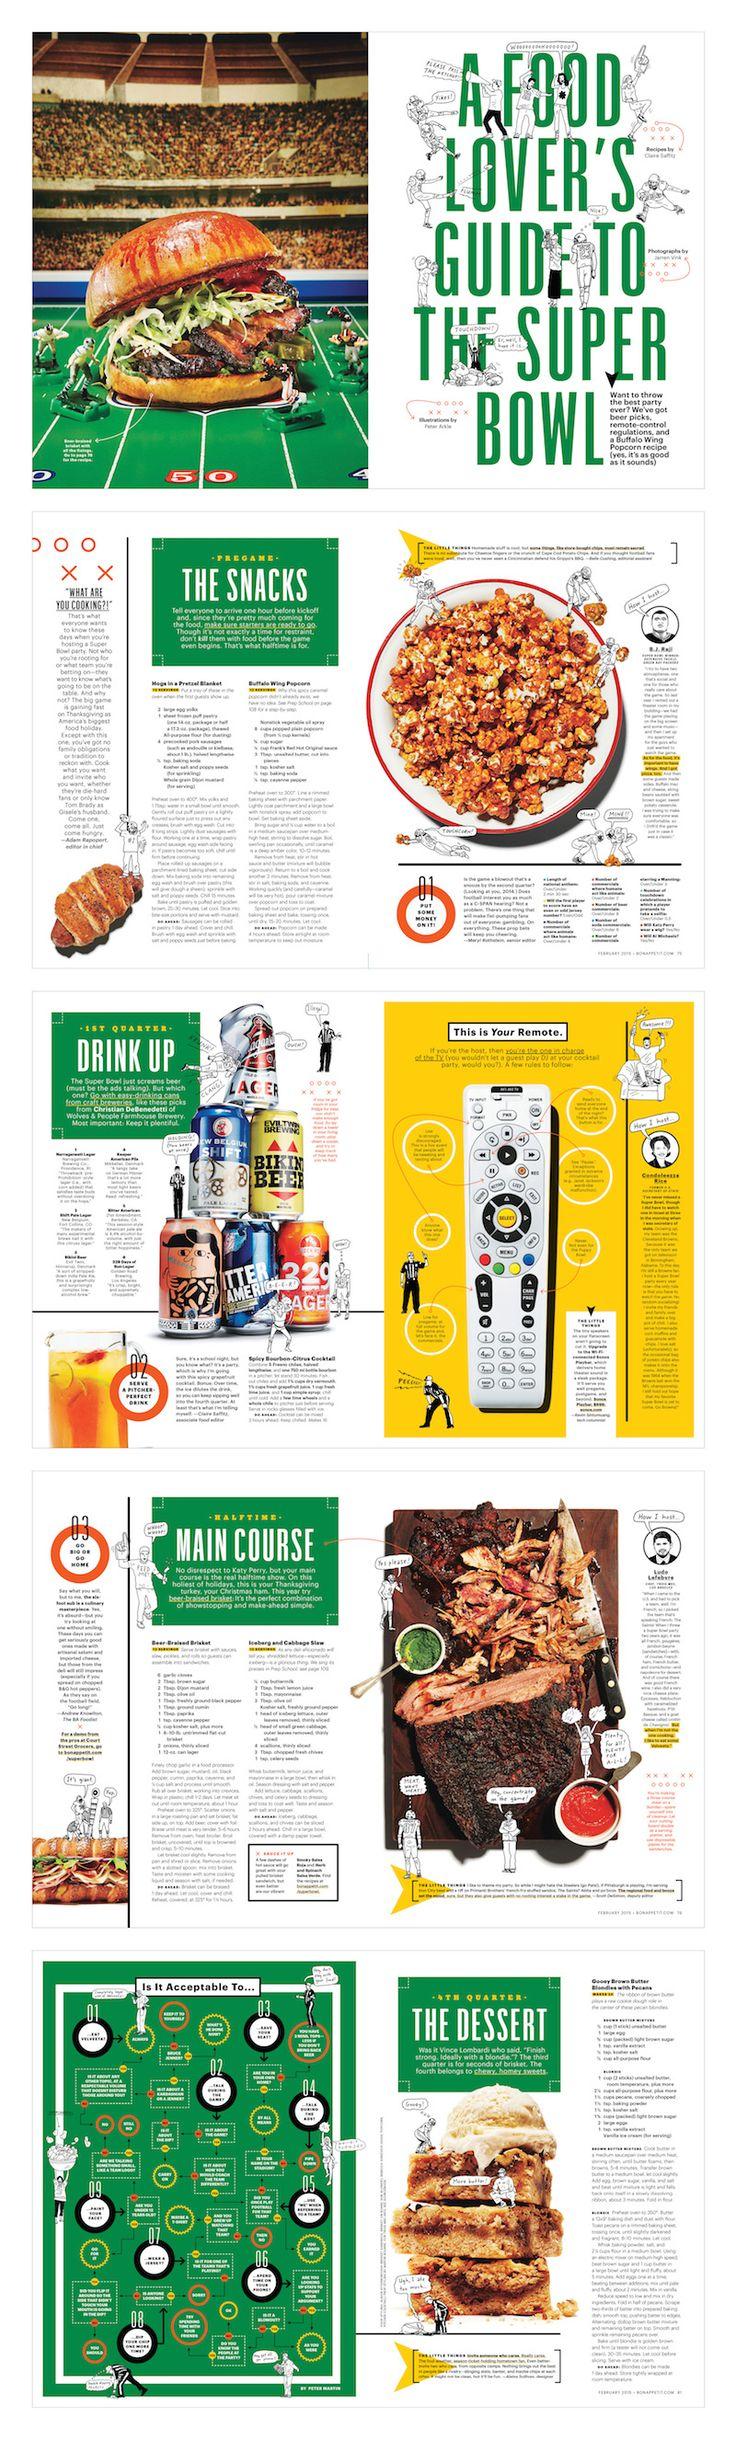 A Food Lover's Guide to the Super Bowl - Bon Appetit - Alaina Sullivan